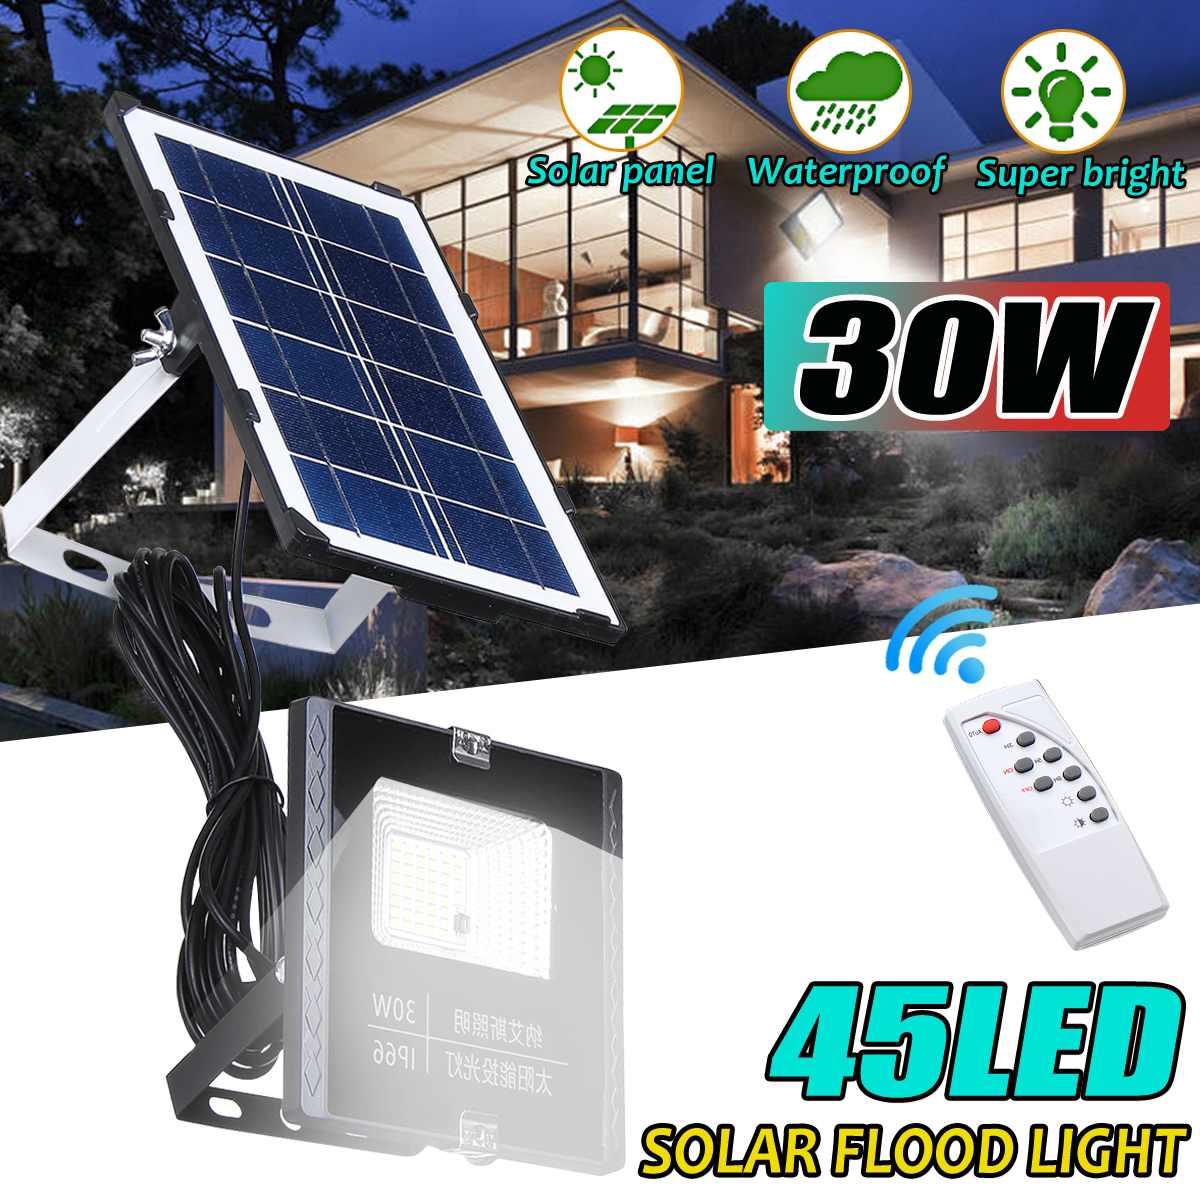 Reflector Solar 30W 45 foco LED portátil reflector al aire libre calle Jardín luz impermeable lámpara de pared con Control remoto